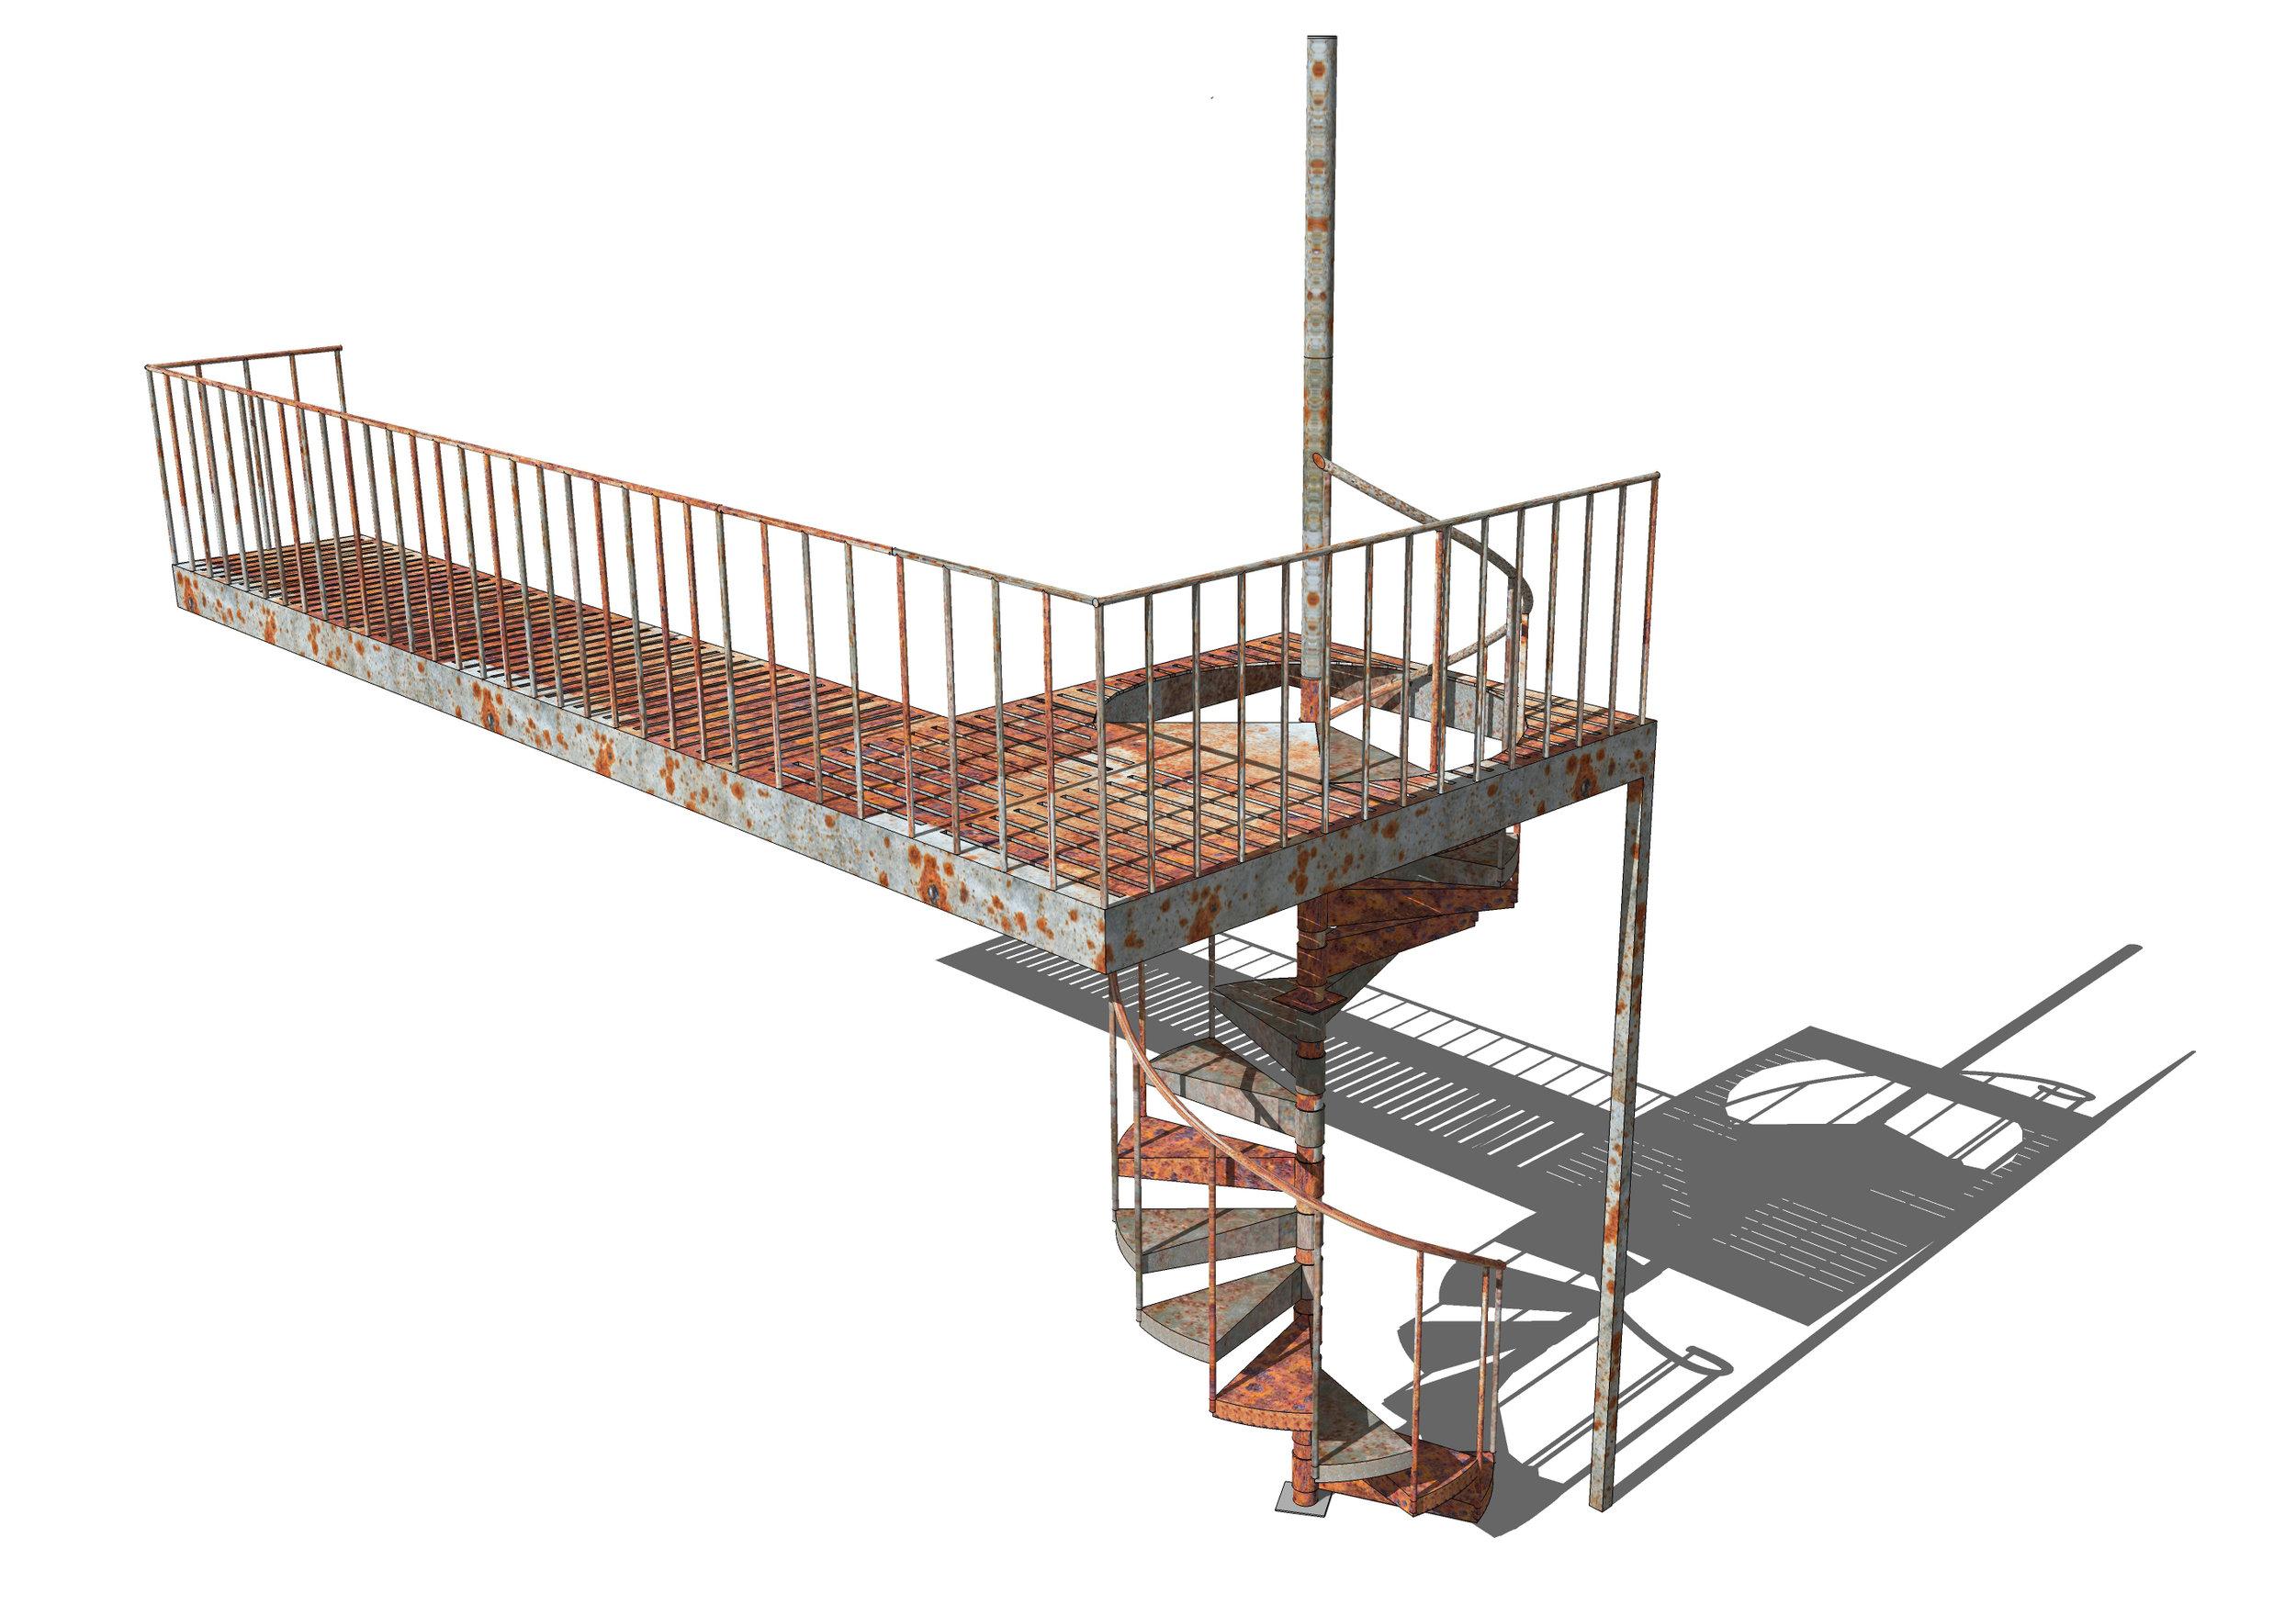 LSOH Fire Escape Design Design 2.jpg